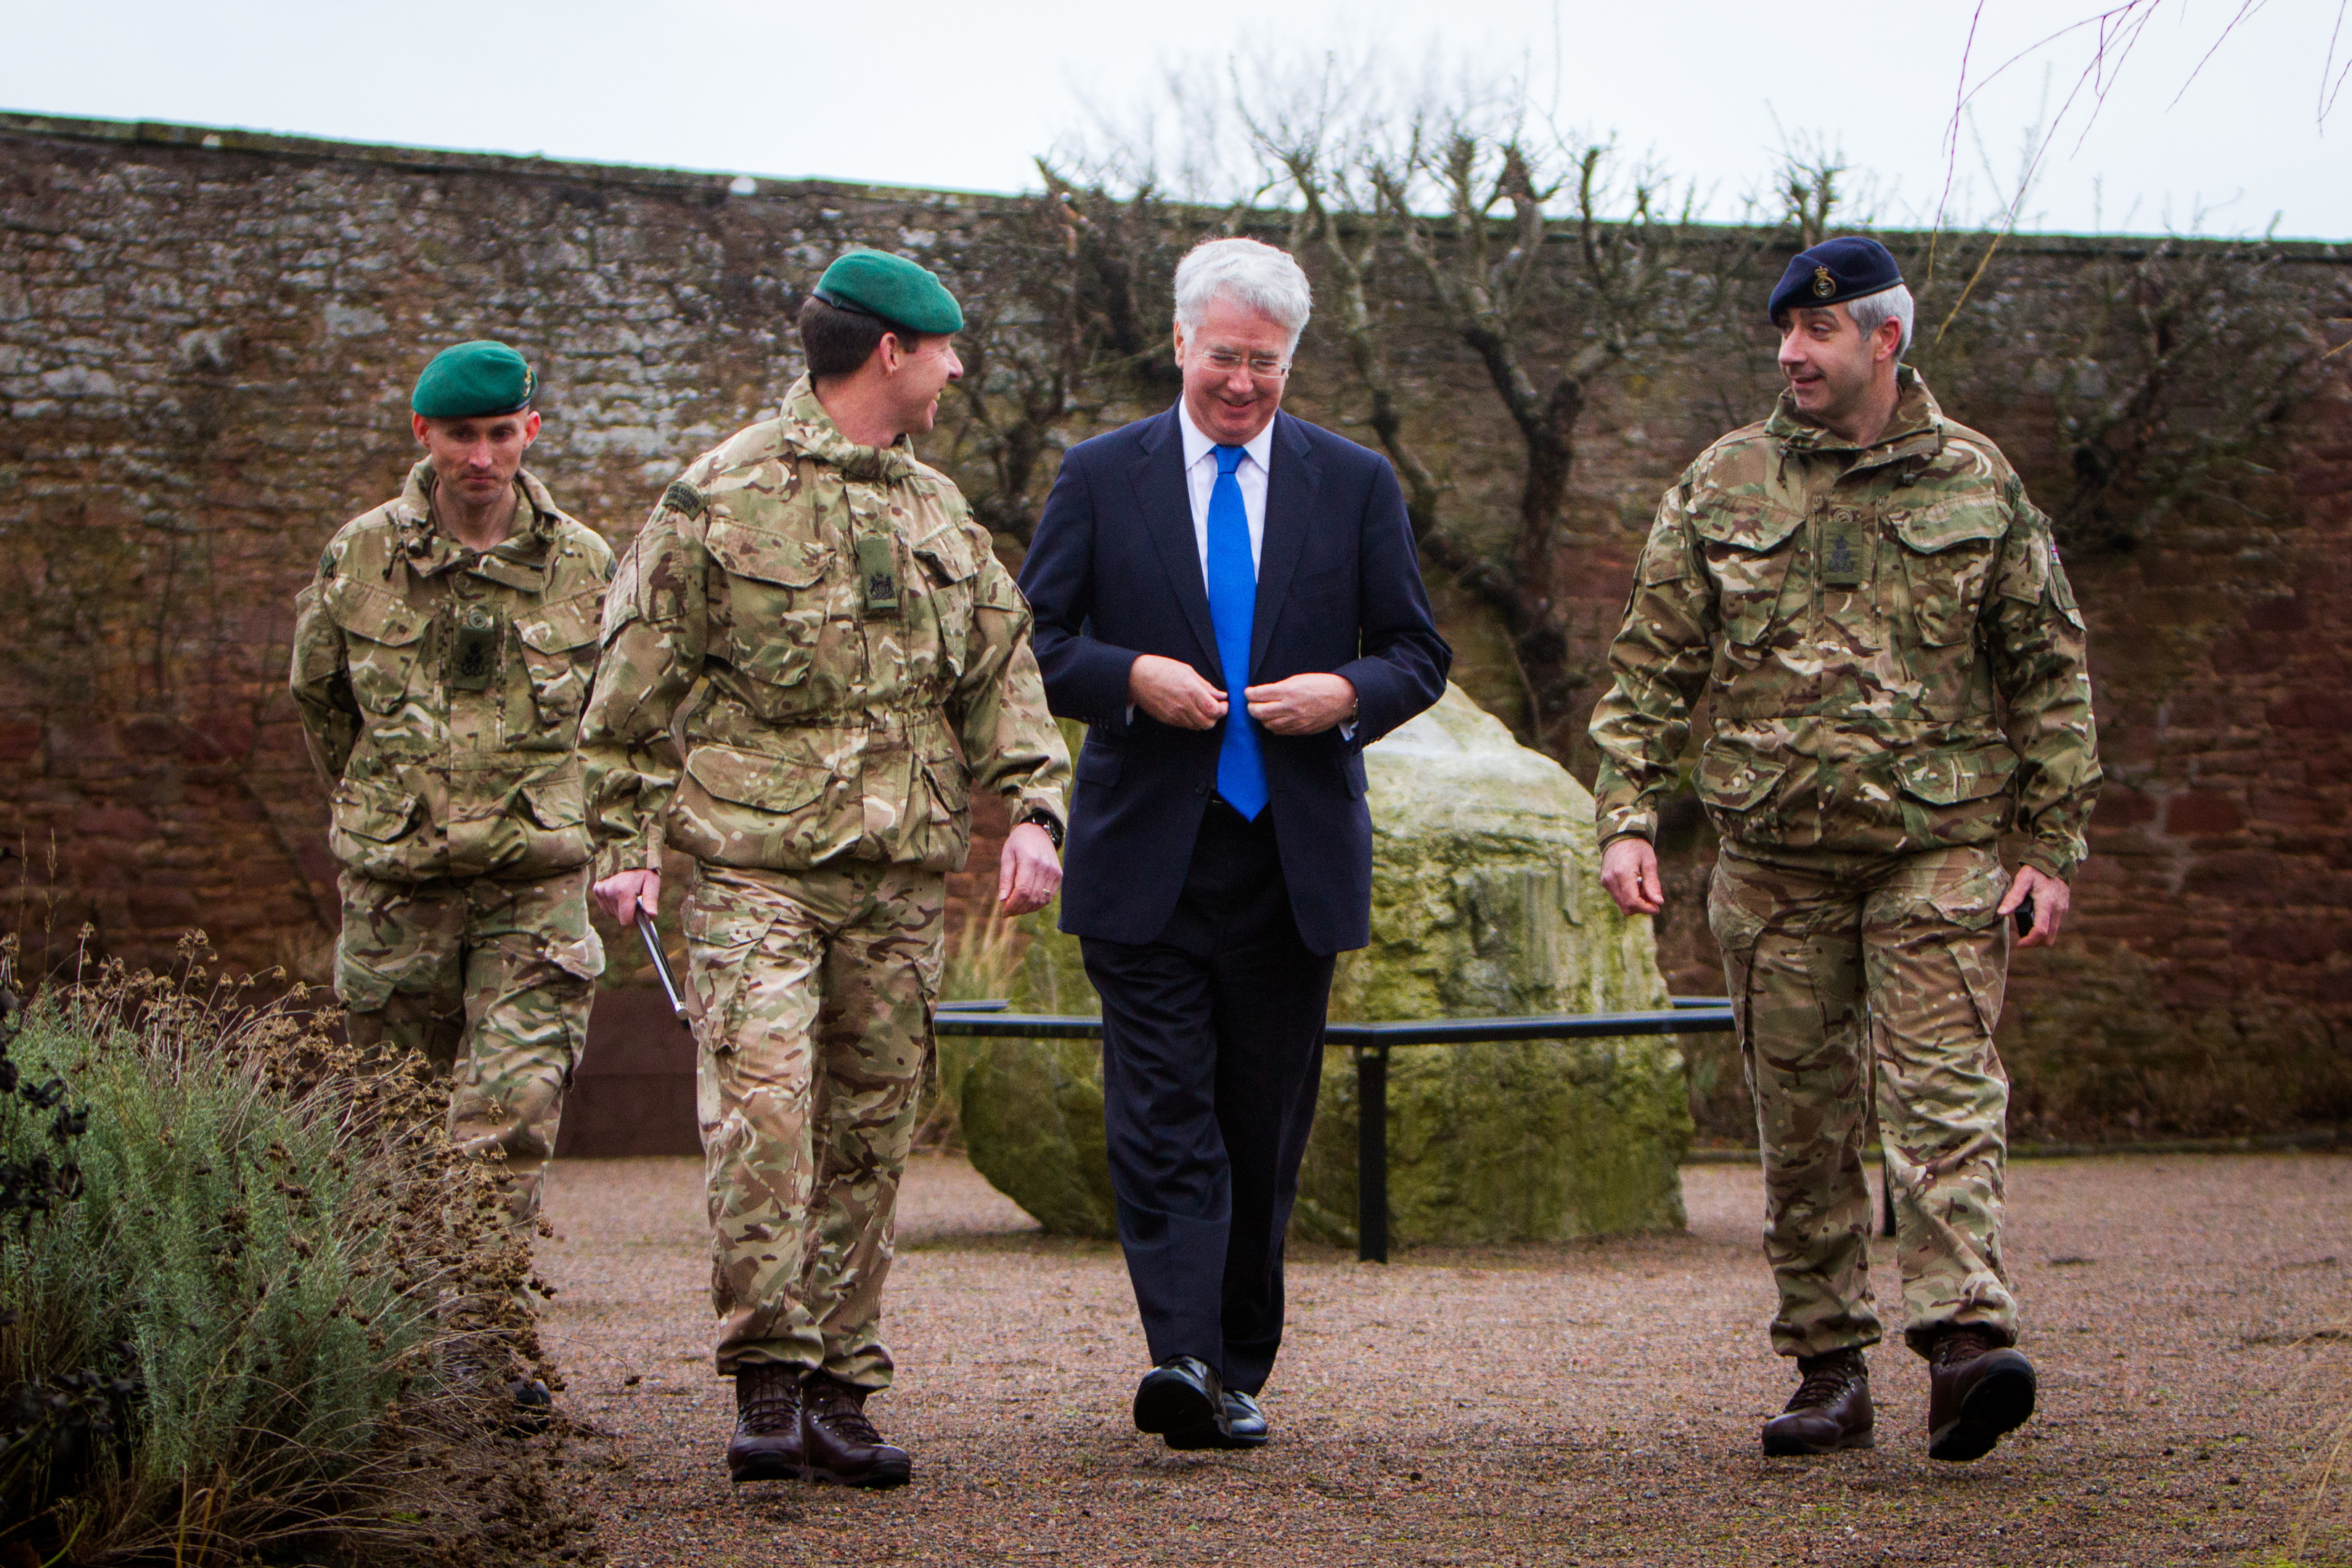 Secretary of State for Defence Sir Michael Fallon alongside PO Jamie Jackson (left), Regimental Lt Sgt Maj WOI Wilson and PO Ian Dixon (right) at RM Condor, Arbroath.